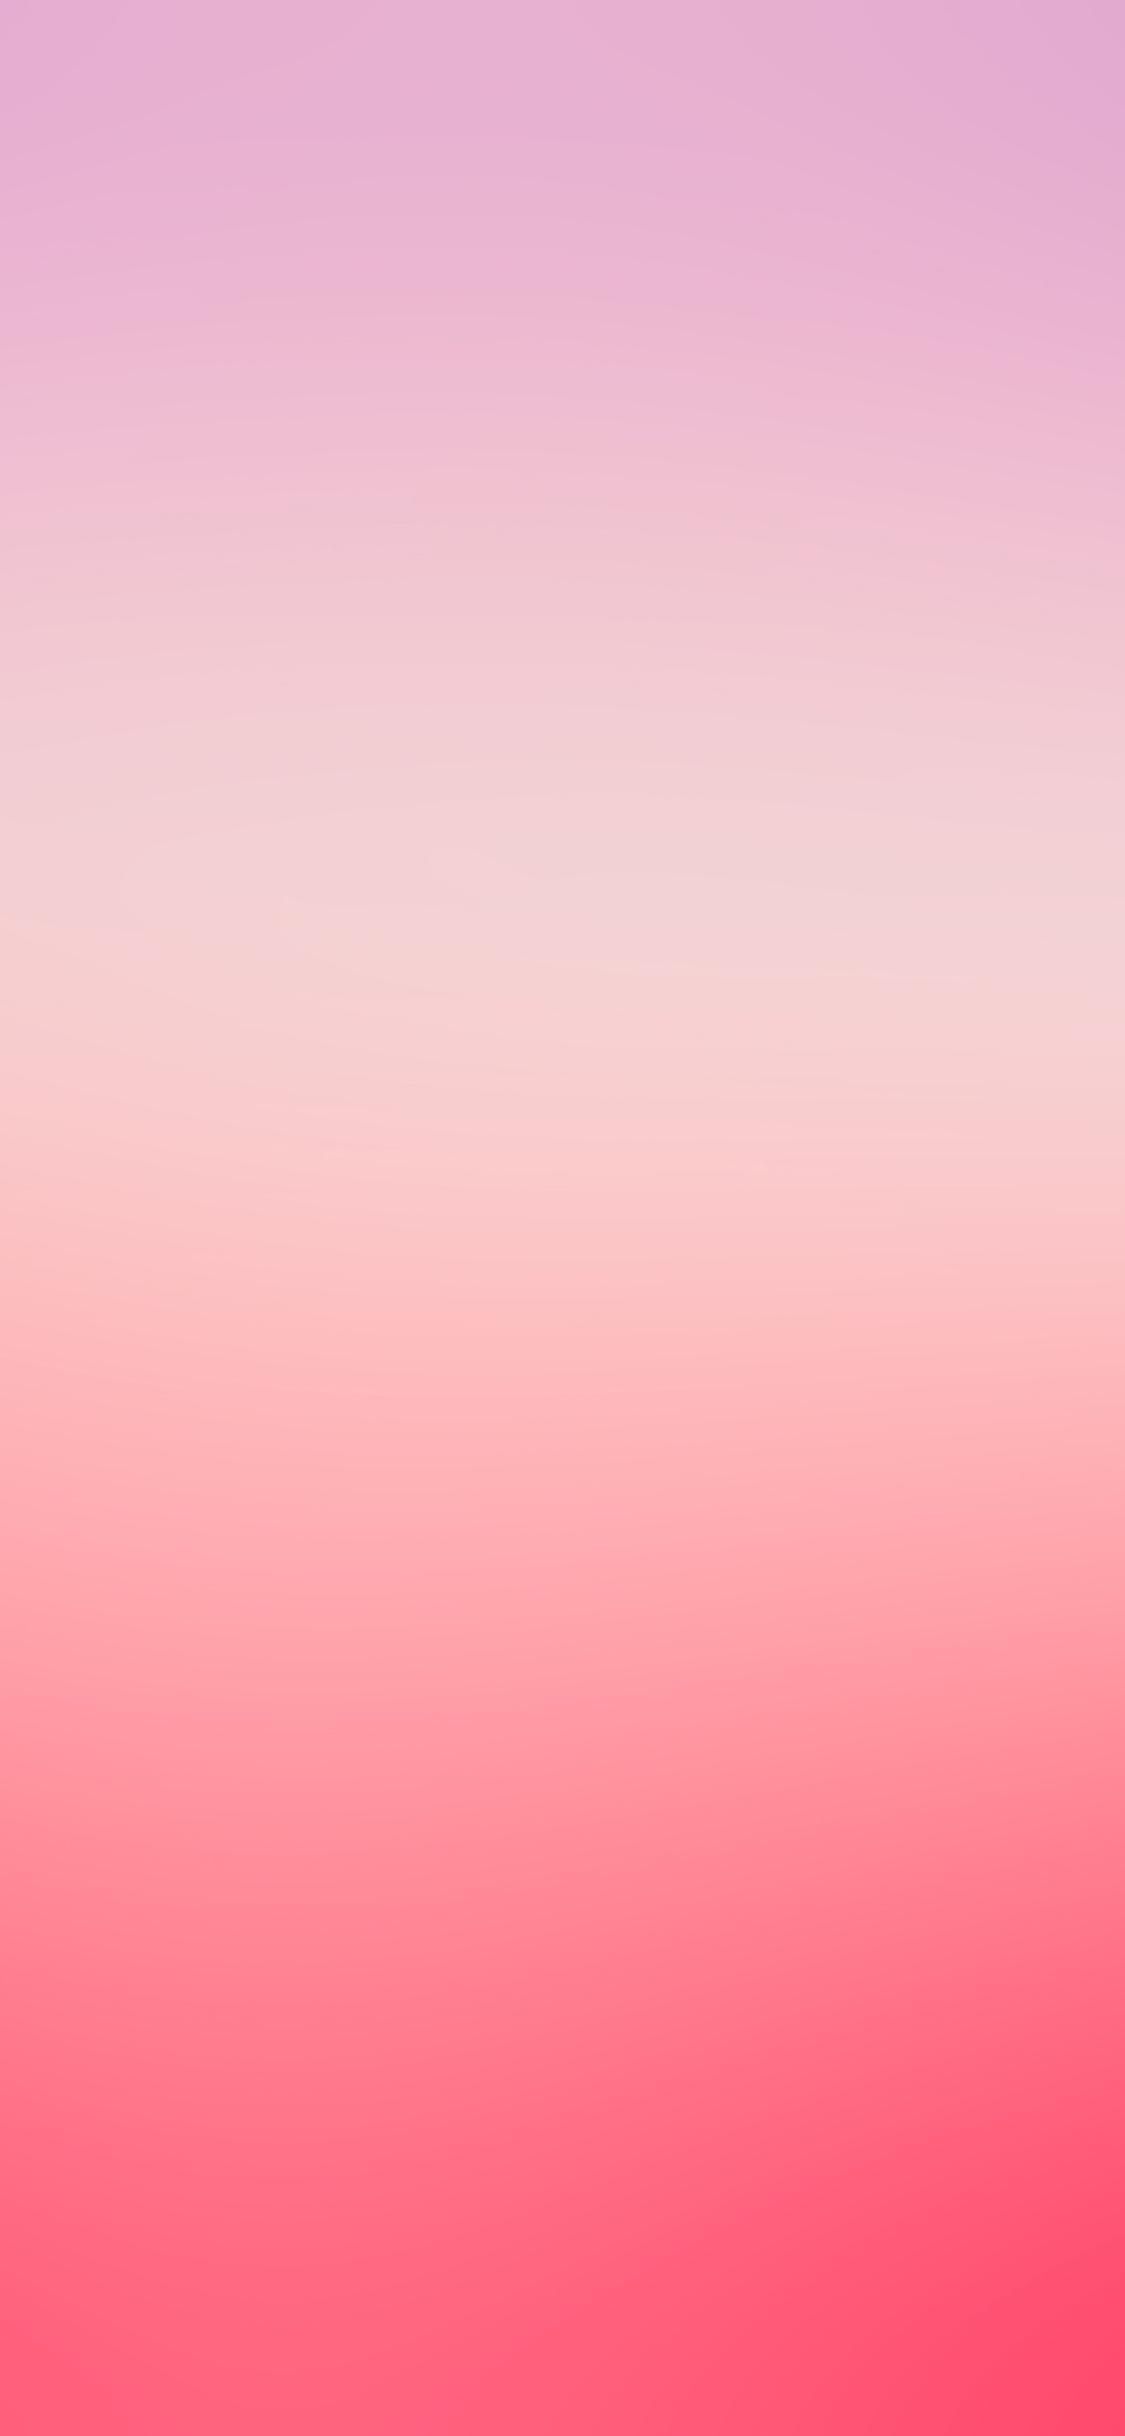 iPhoneXpapers.com-Apple-iPhone-wallpaper-sb25-wallpaper-foundation-blur